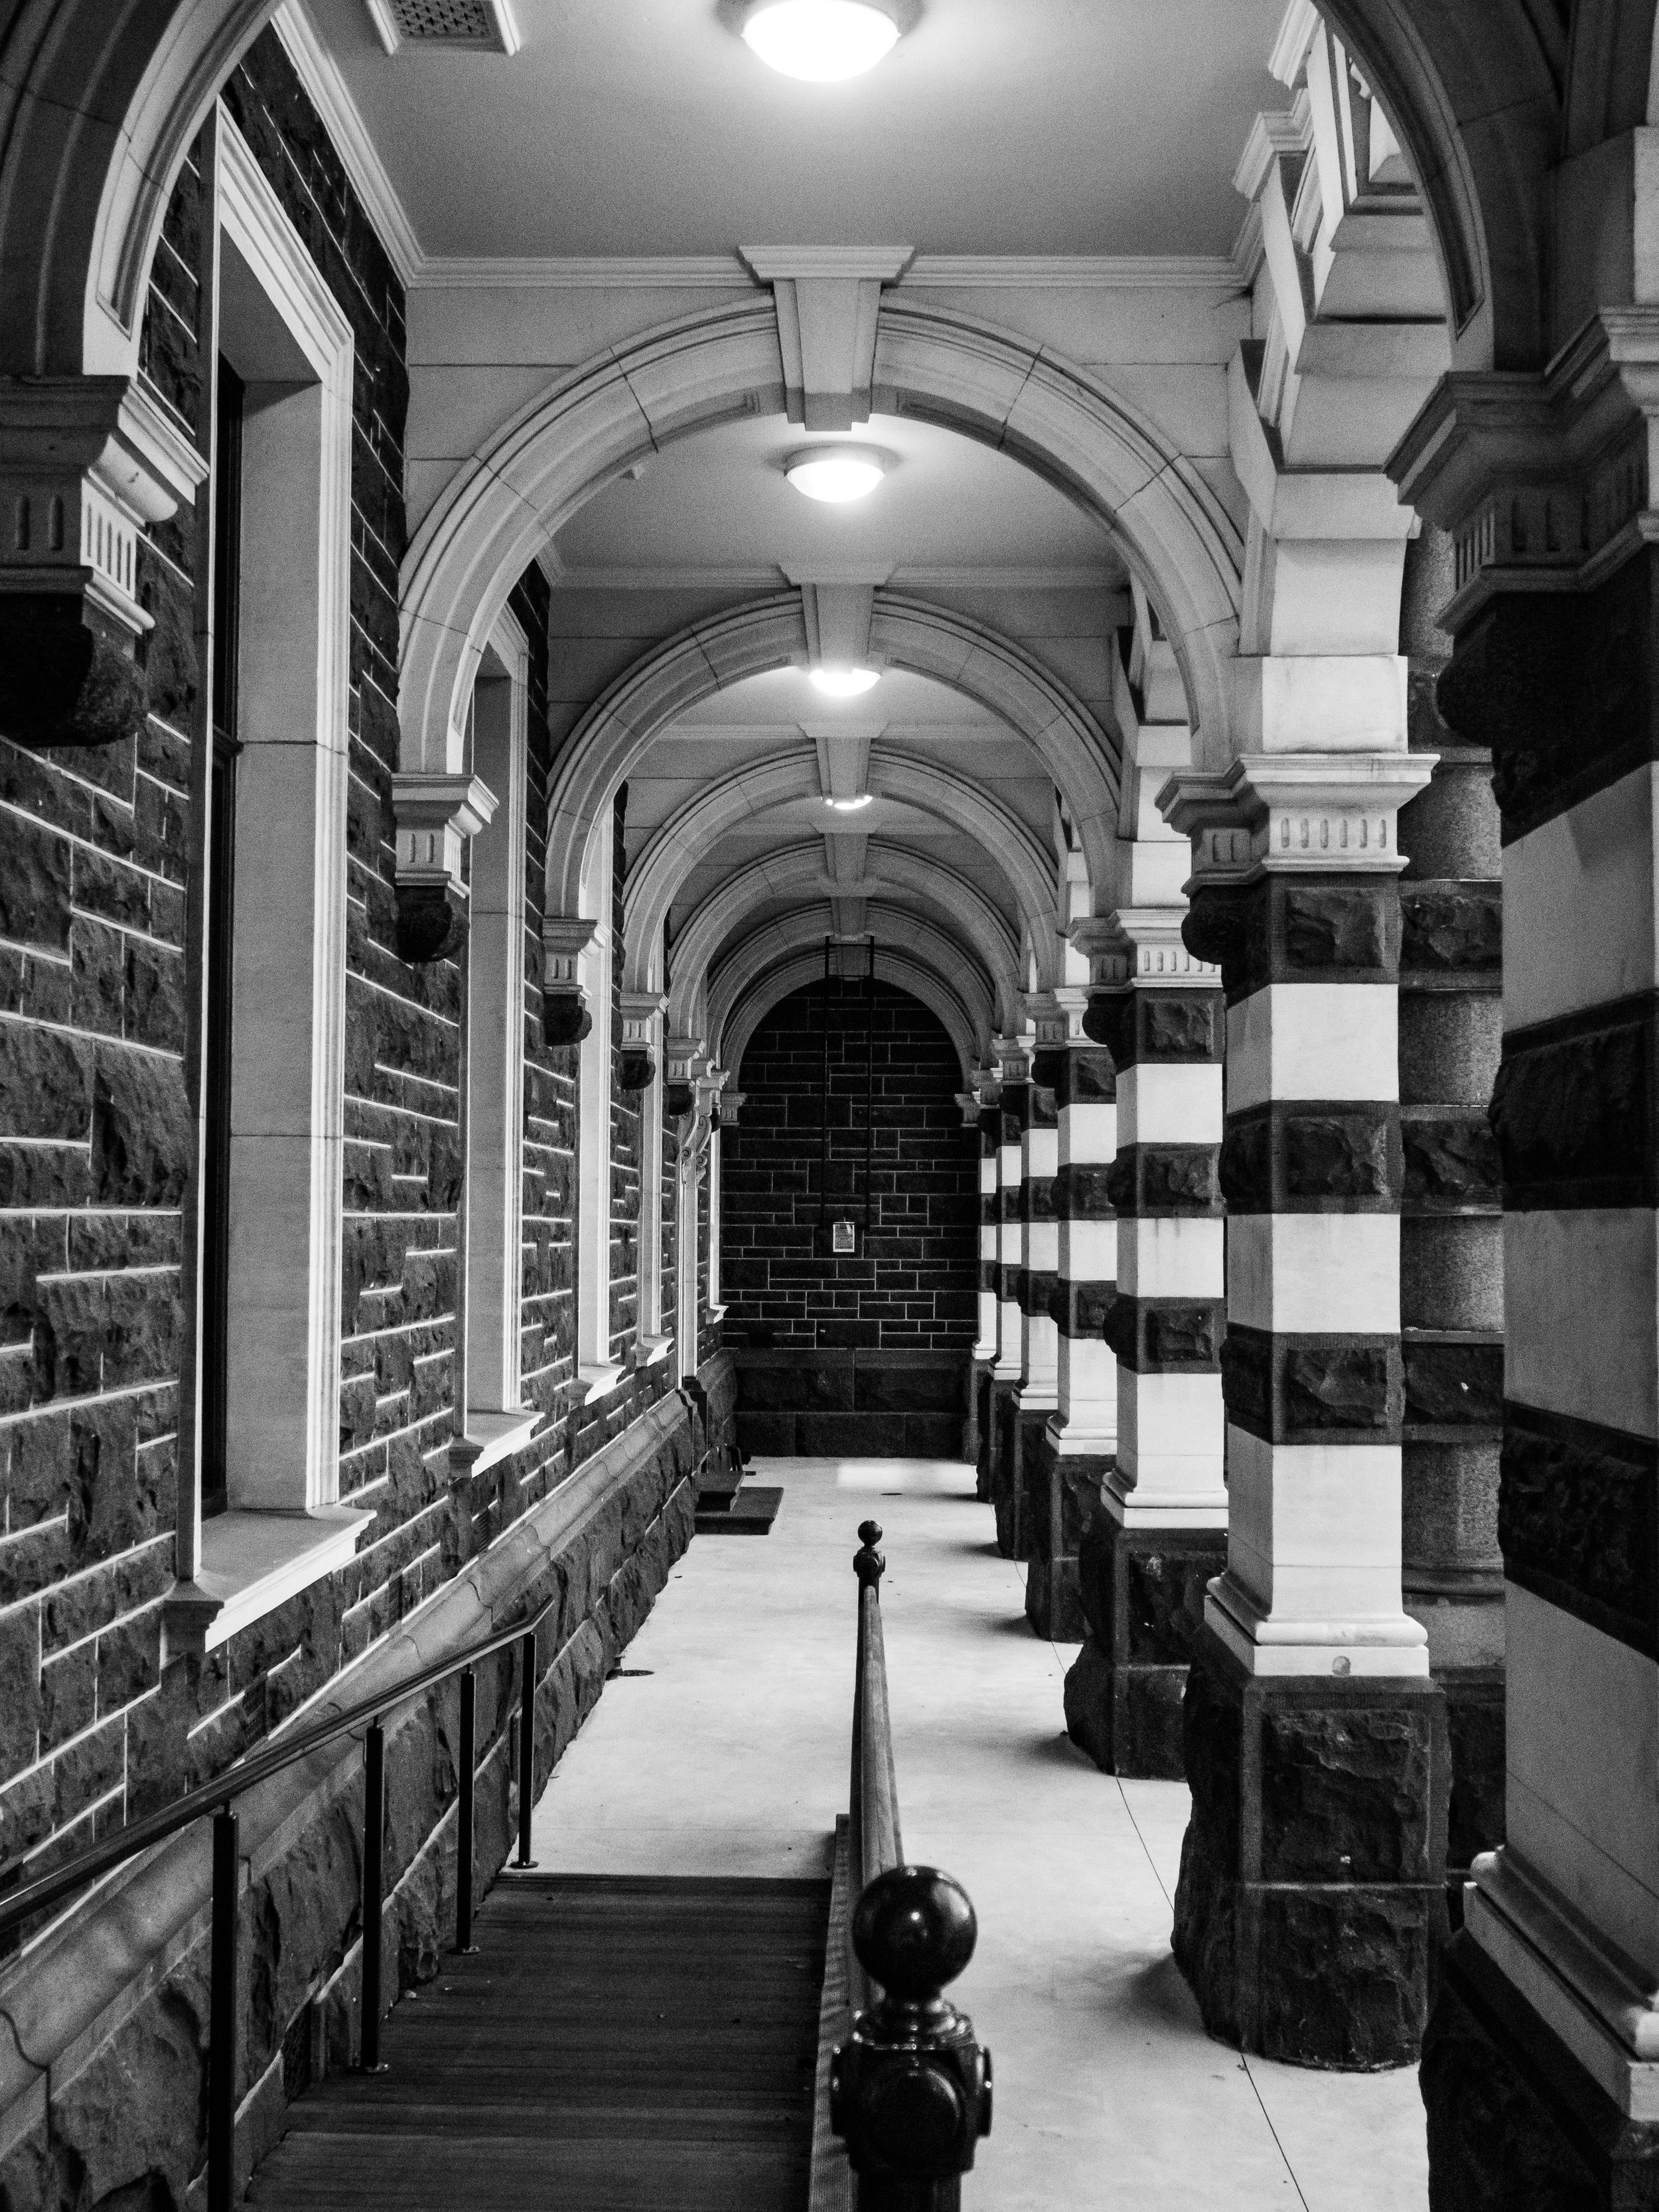 Dunedin railway station pillars in black and white